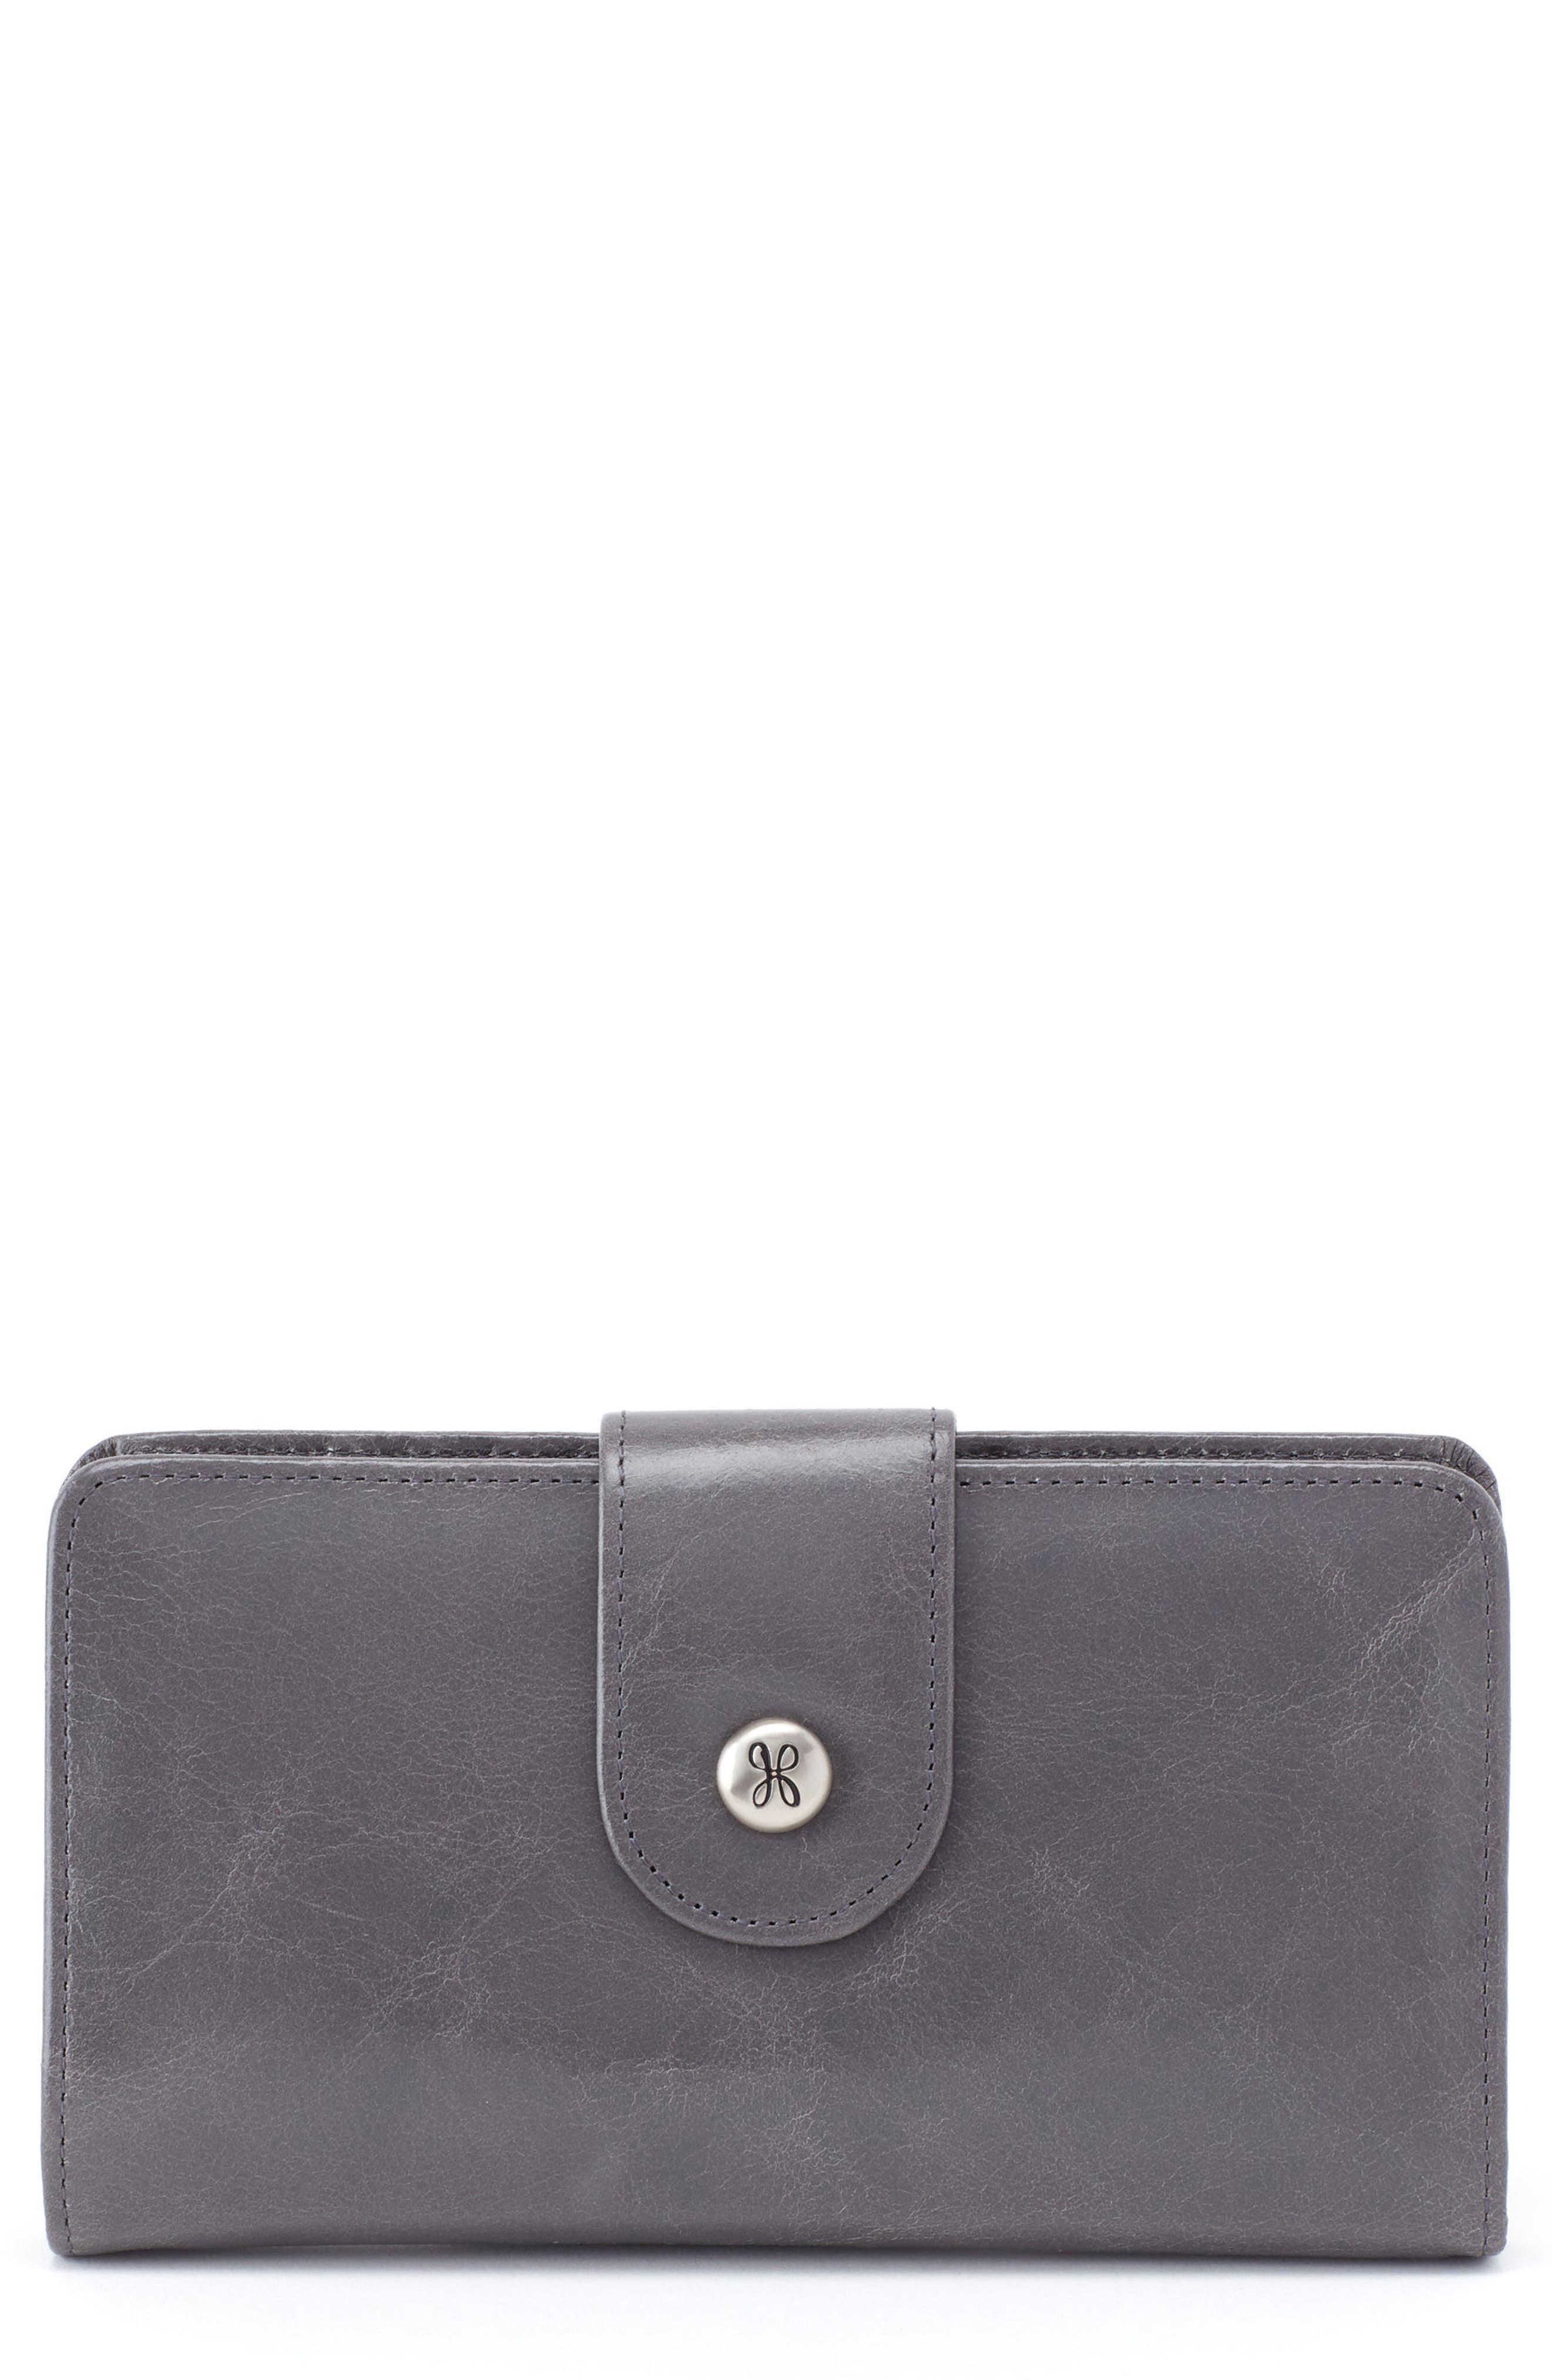 Danette Glazed Continental Wallet,                         Main,                         color, 025